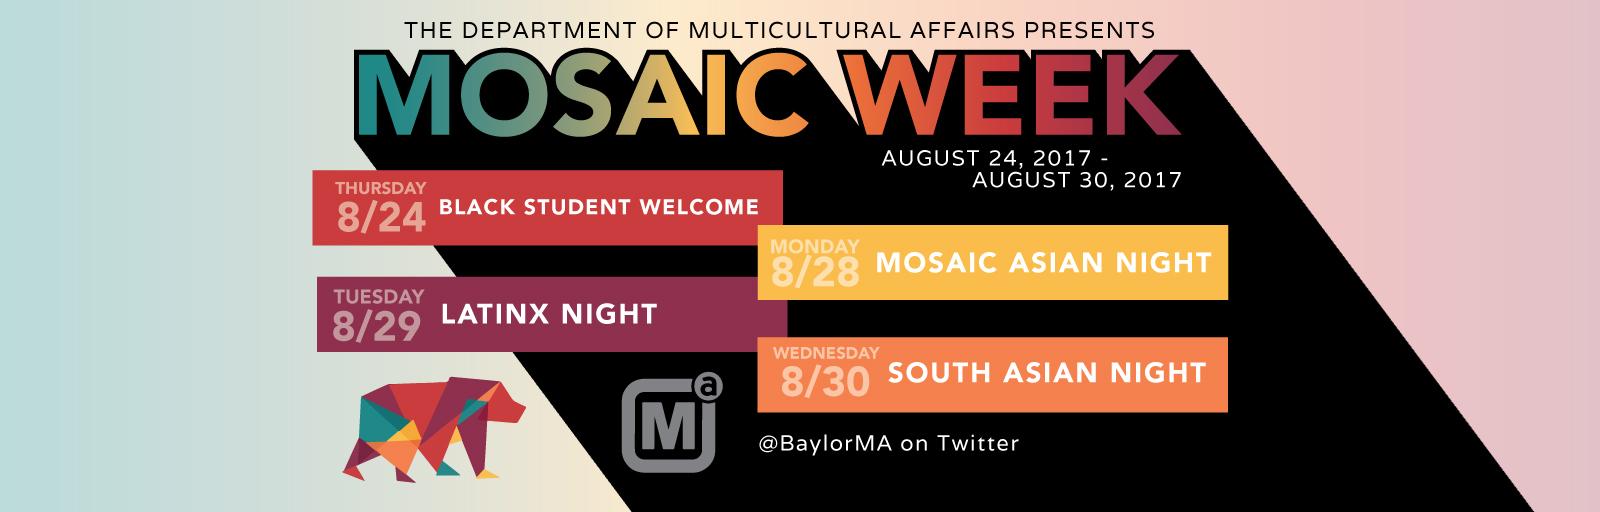 S17_Mosaic-Week_Diversity